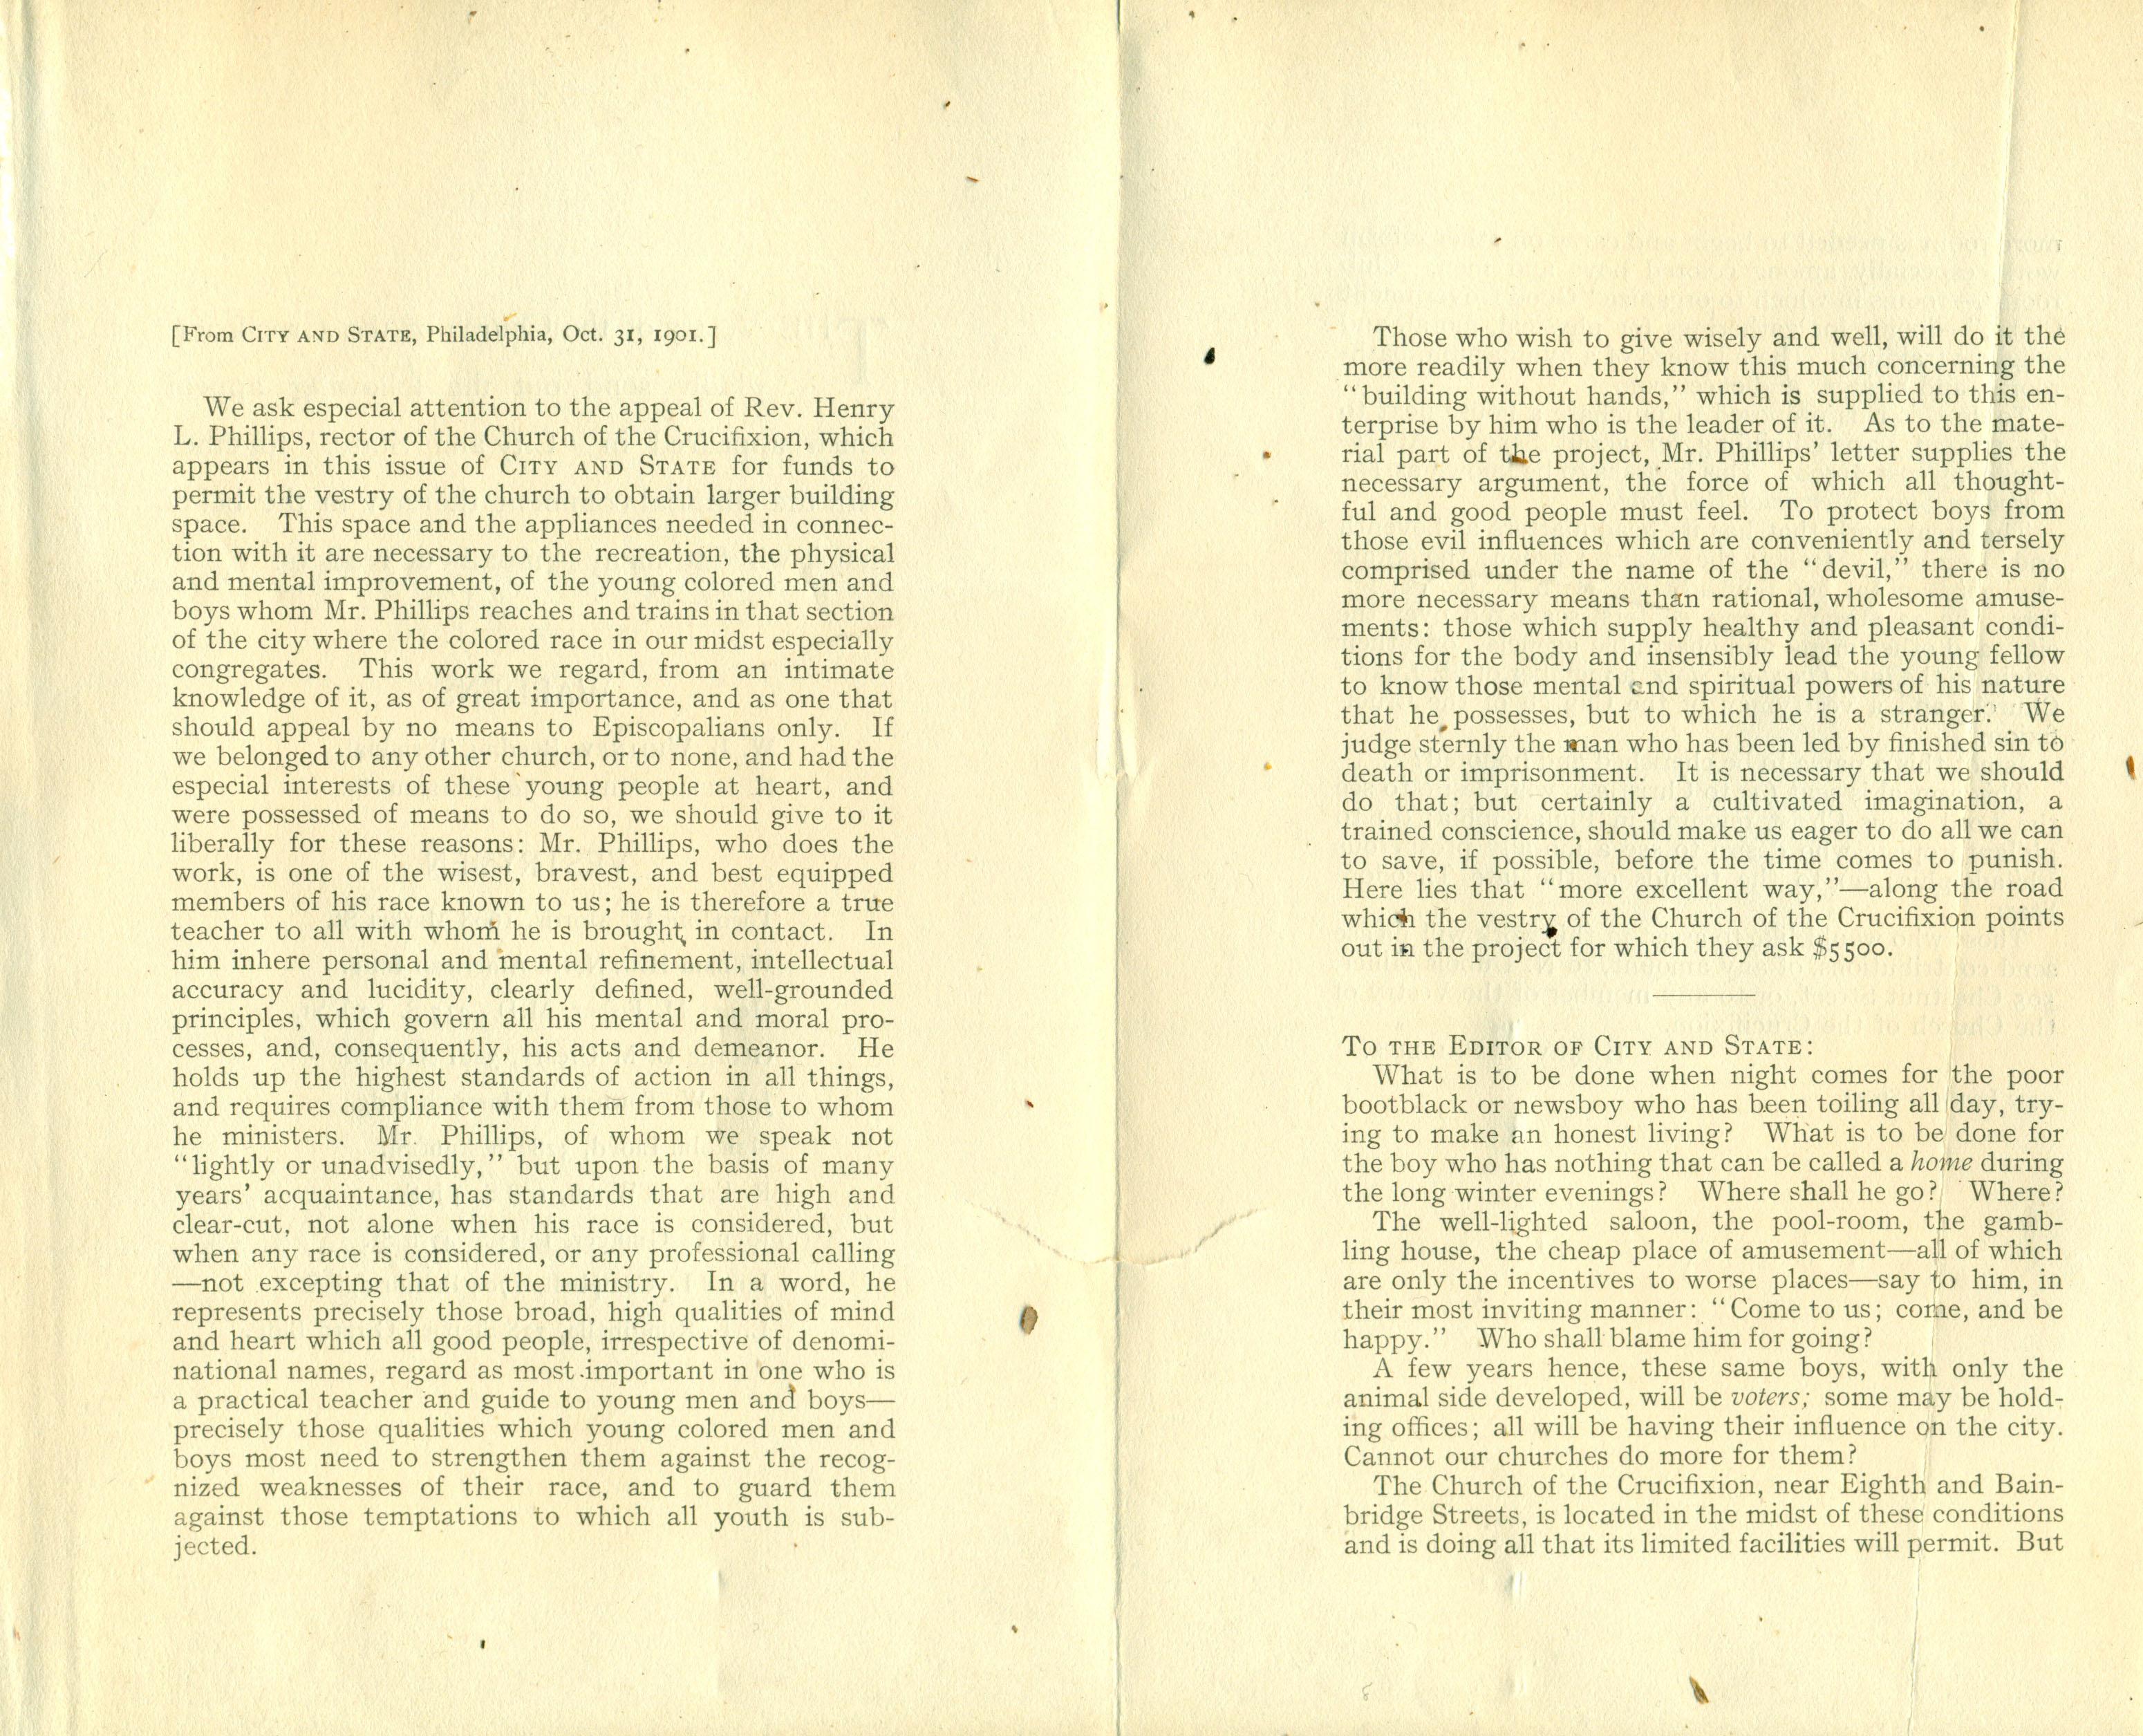 Church of the Crucifixion | Philadelphia Studies | Page 9